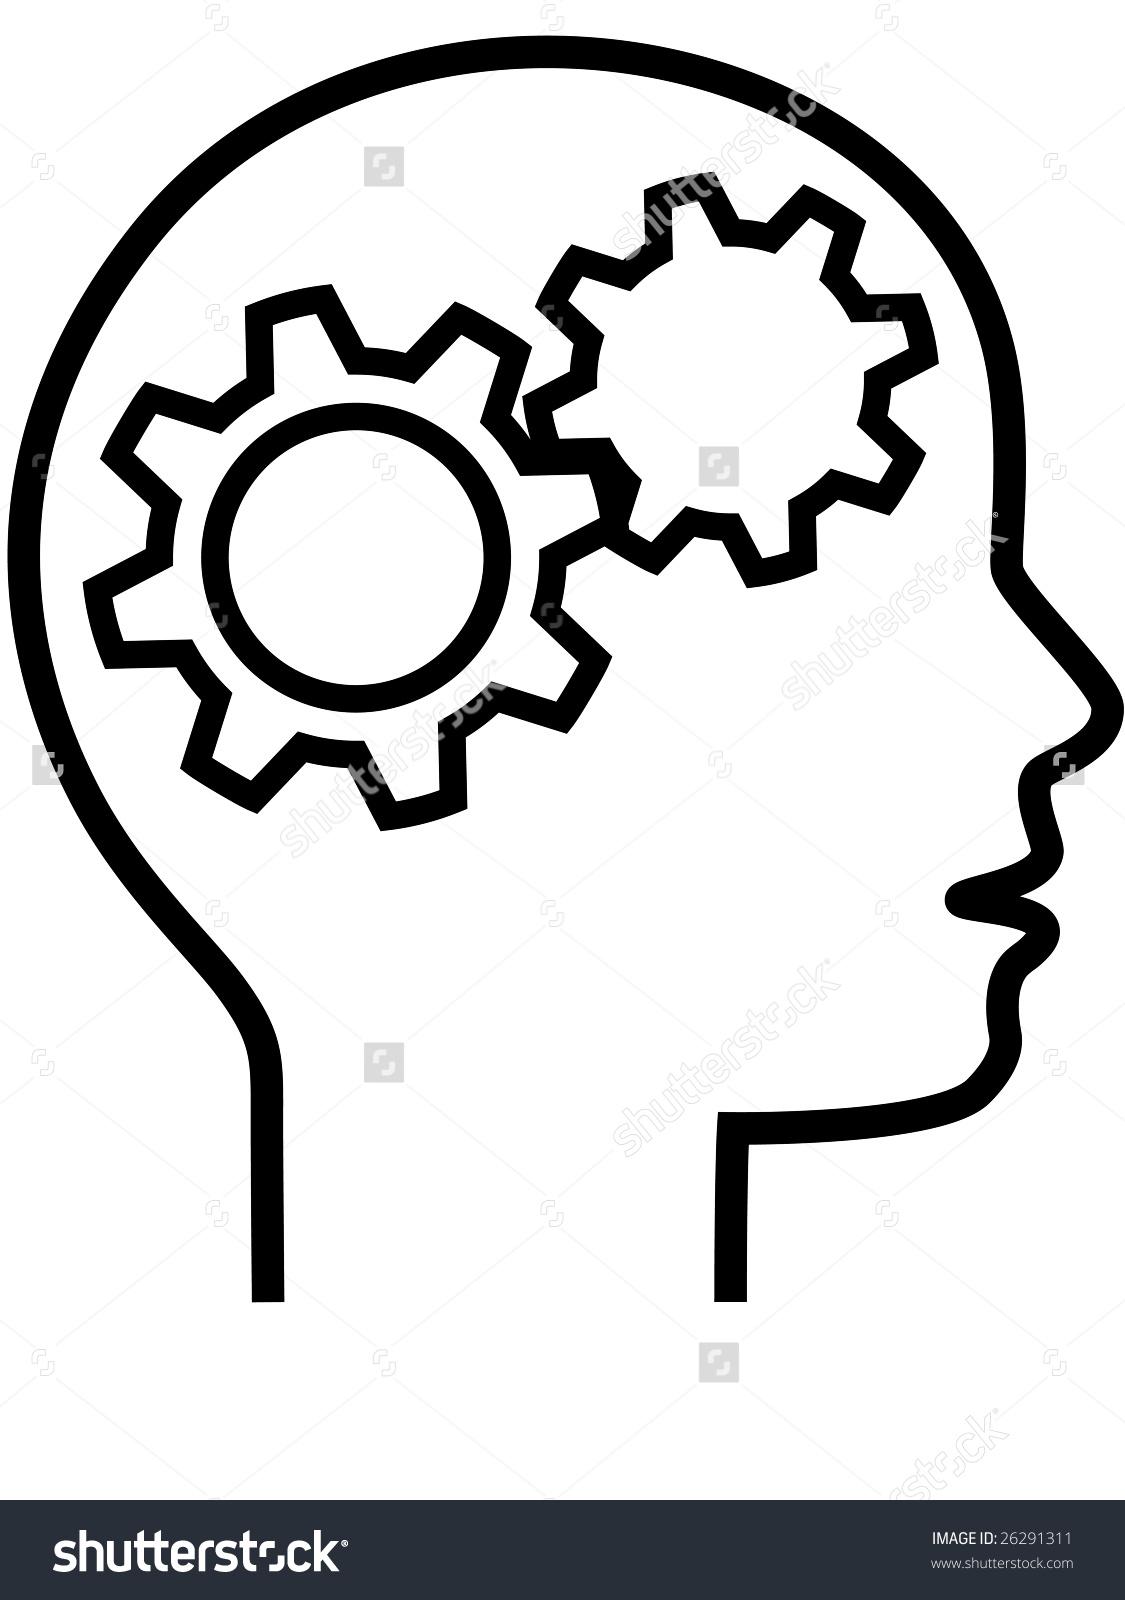 Thinker Inventor Gear Head Brain 2 Stock Vector 26291311.